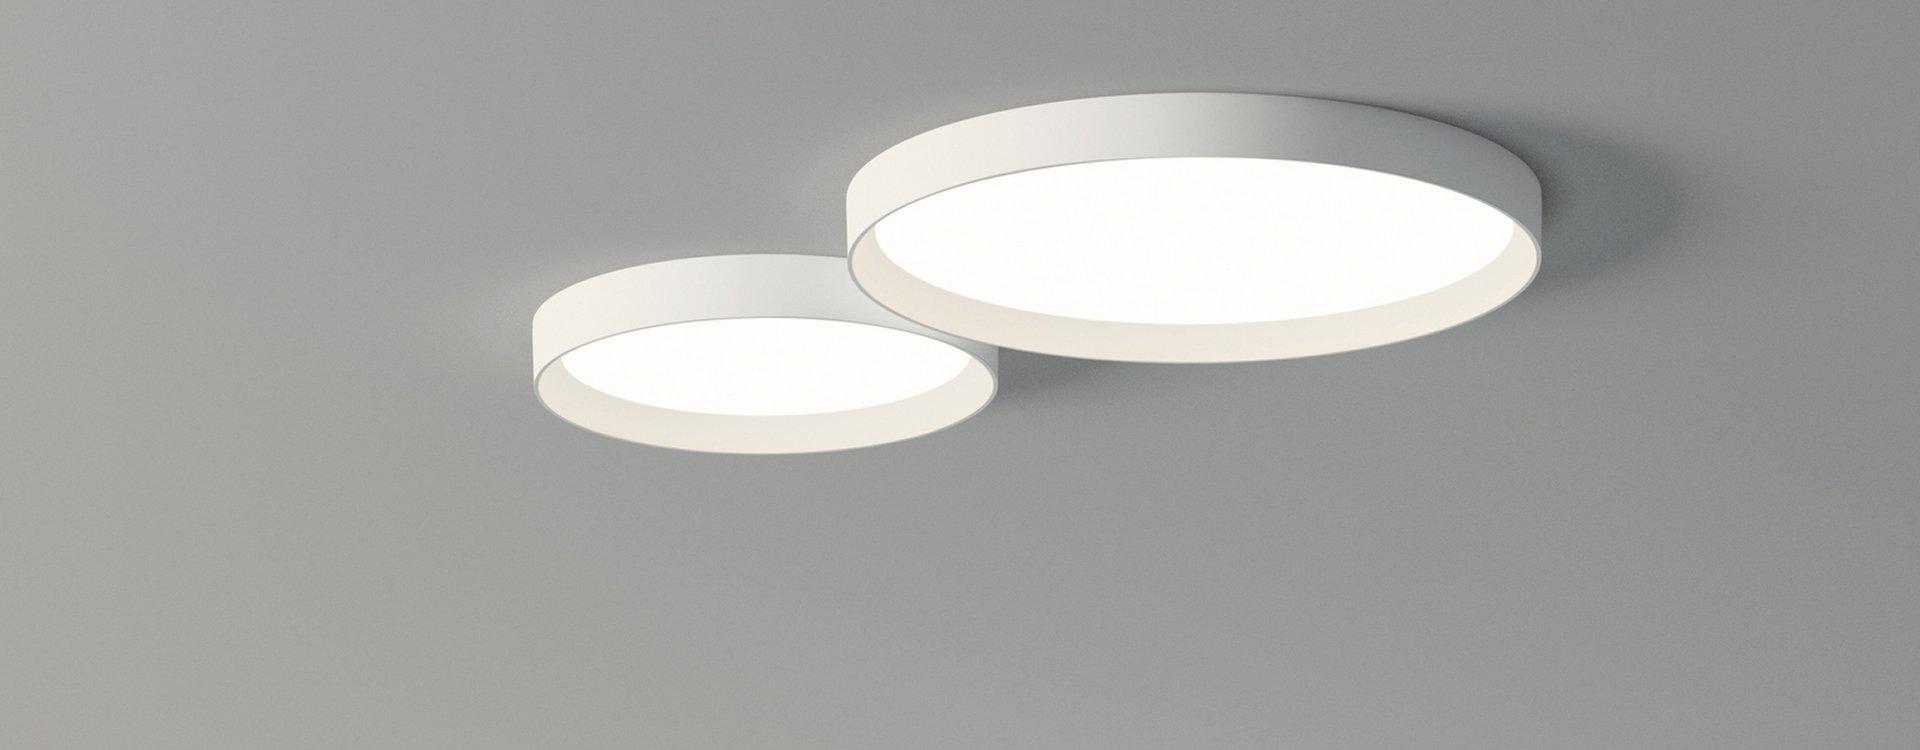 Up lâmpada do teto pequeño 1 x prato LED 30w - Lacado branco fosco